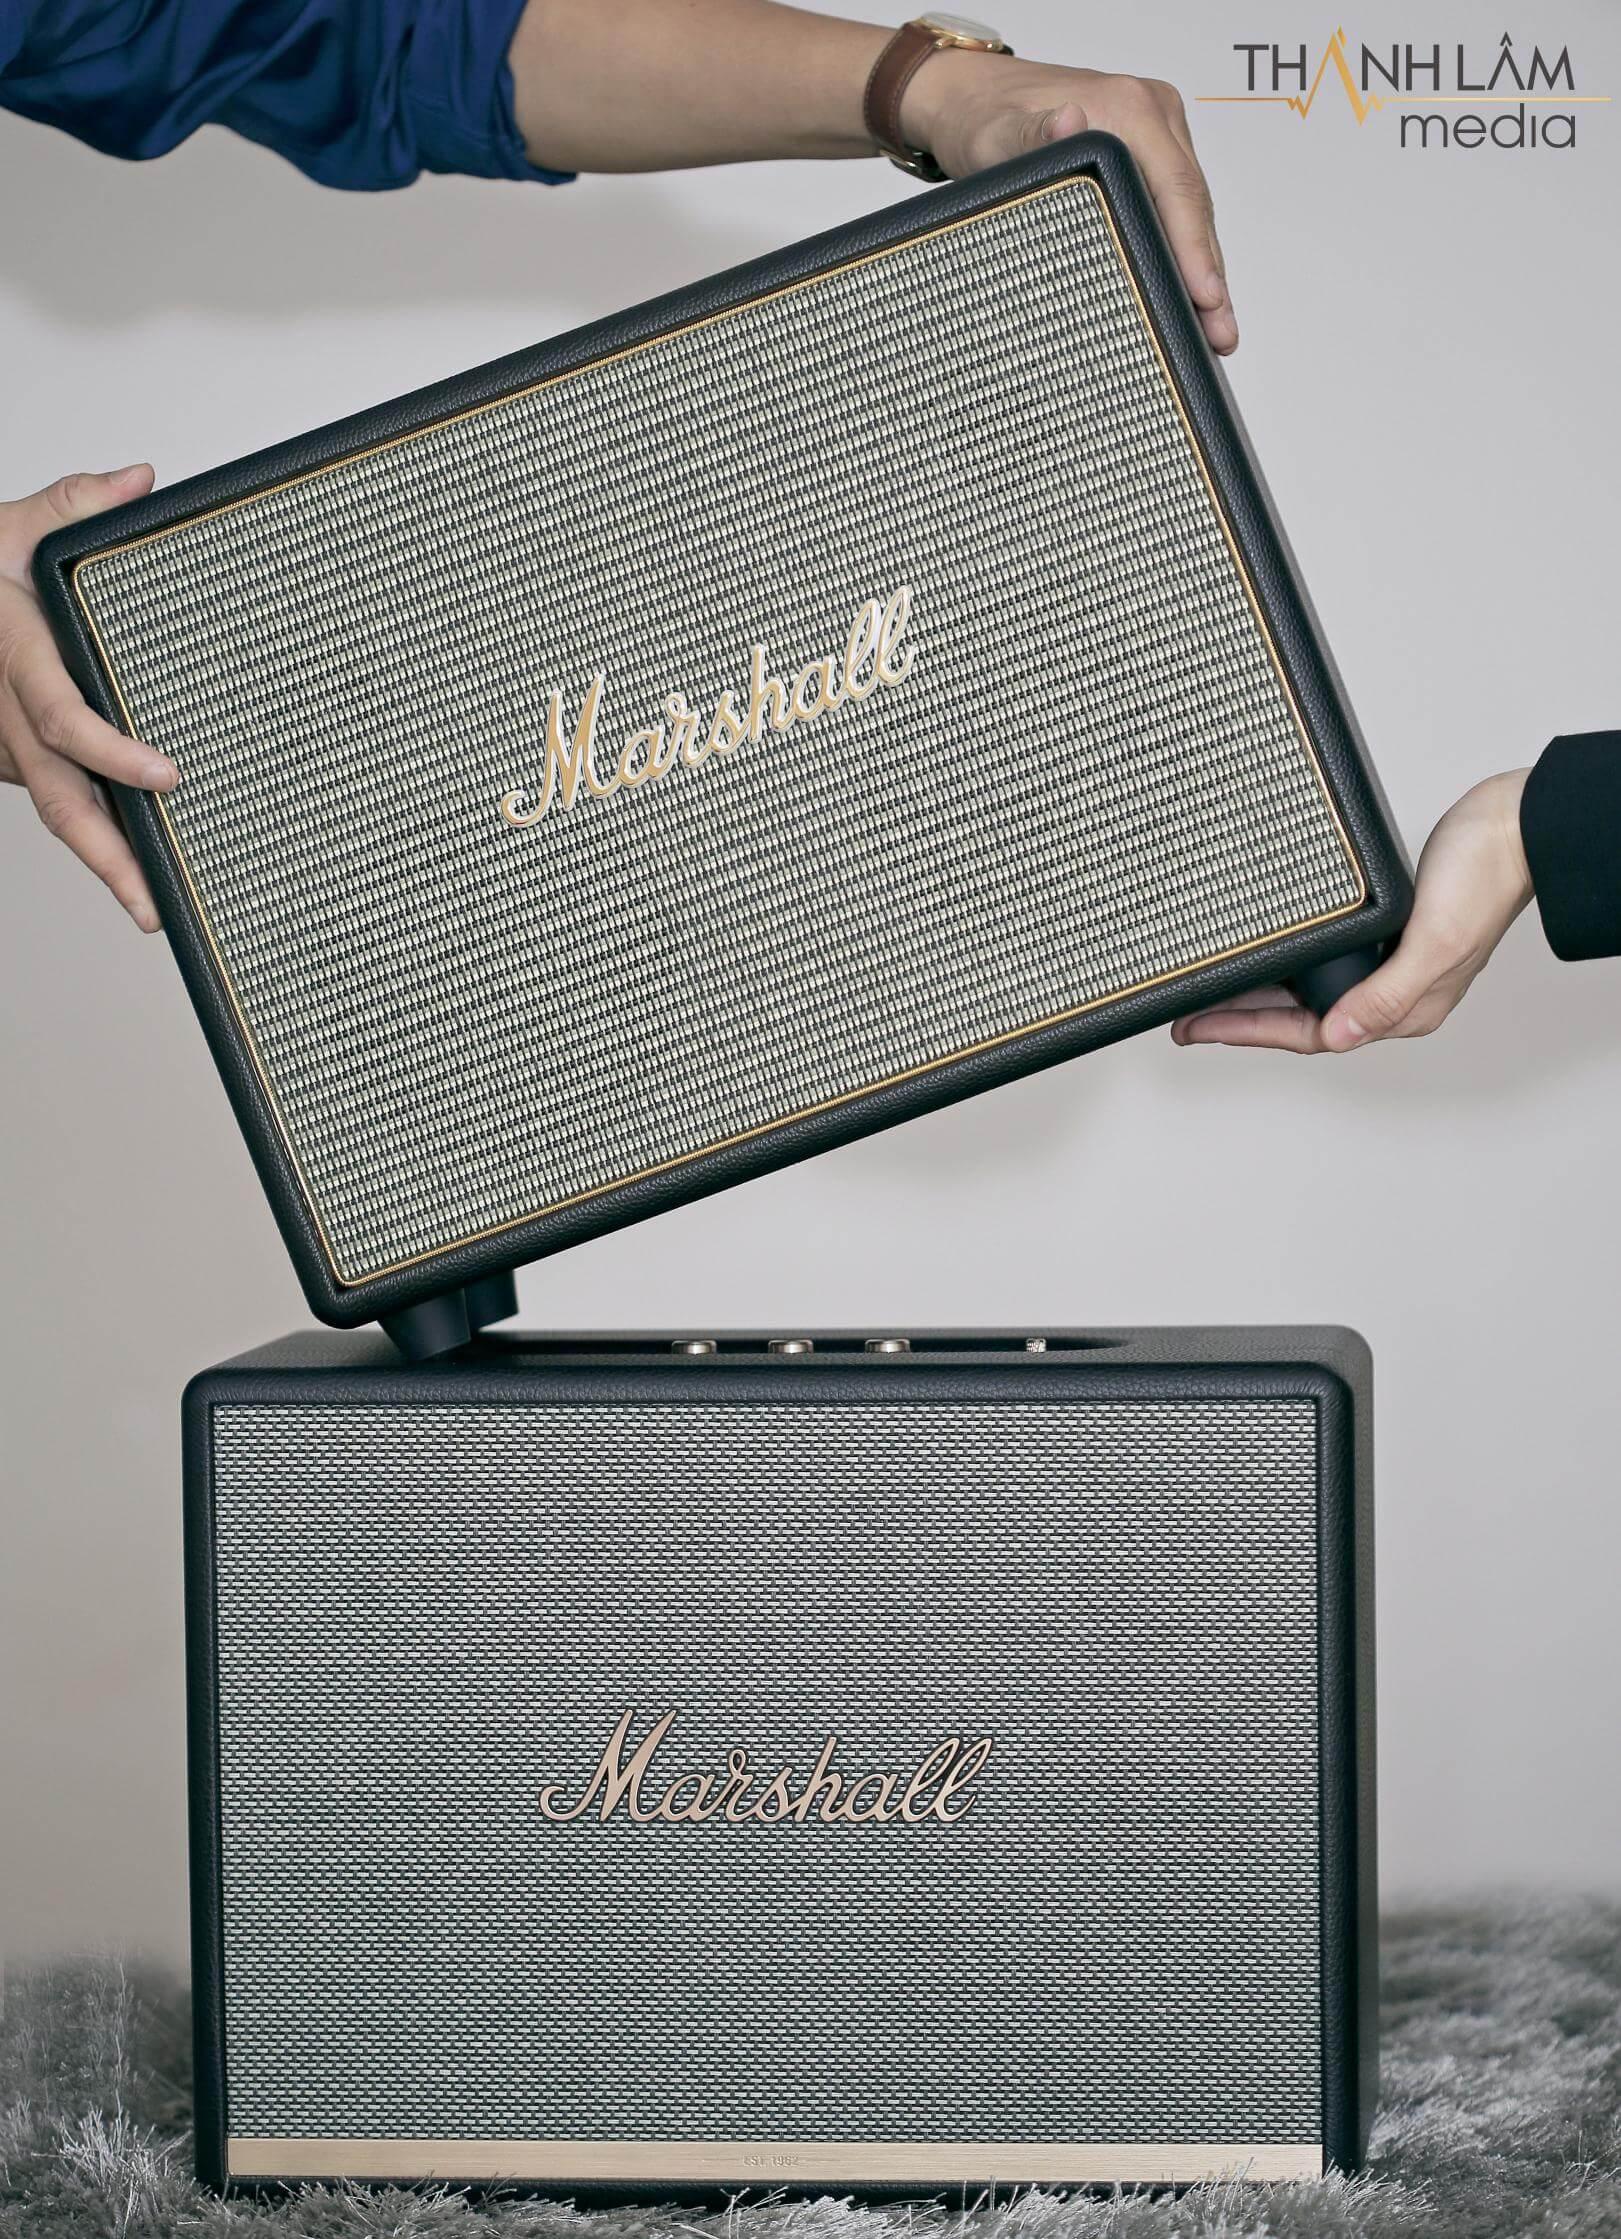 Loa Marshall Woburn và Marshall Woburn II